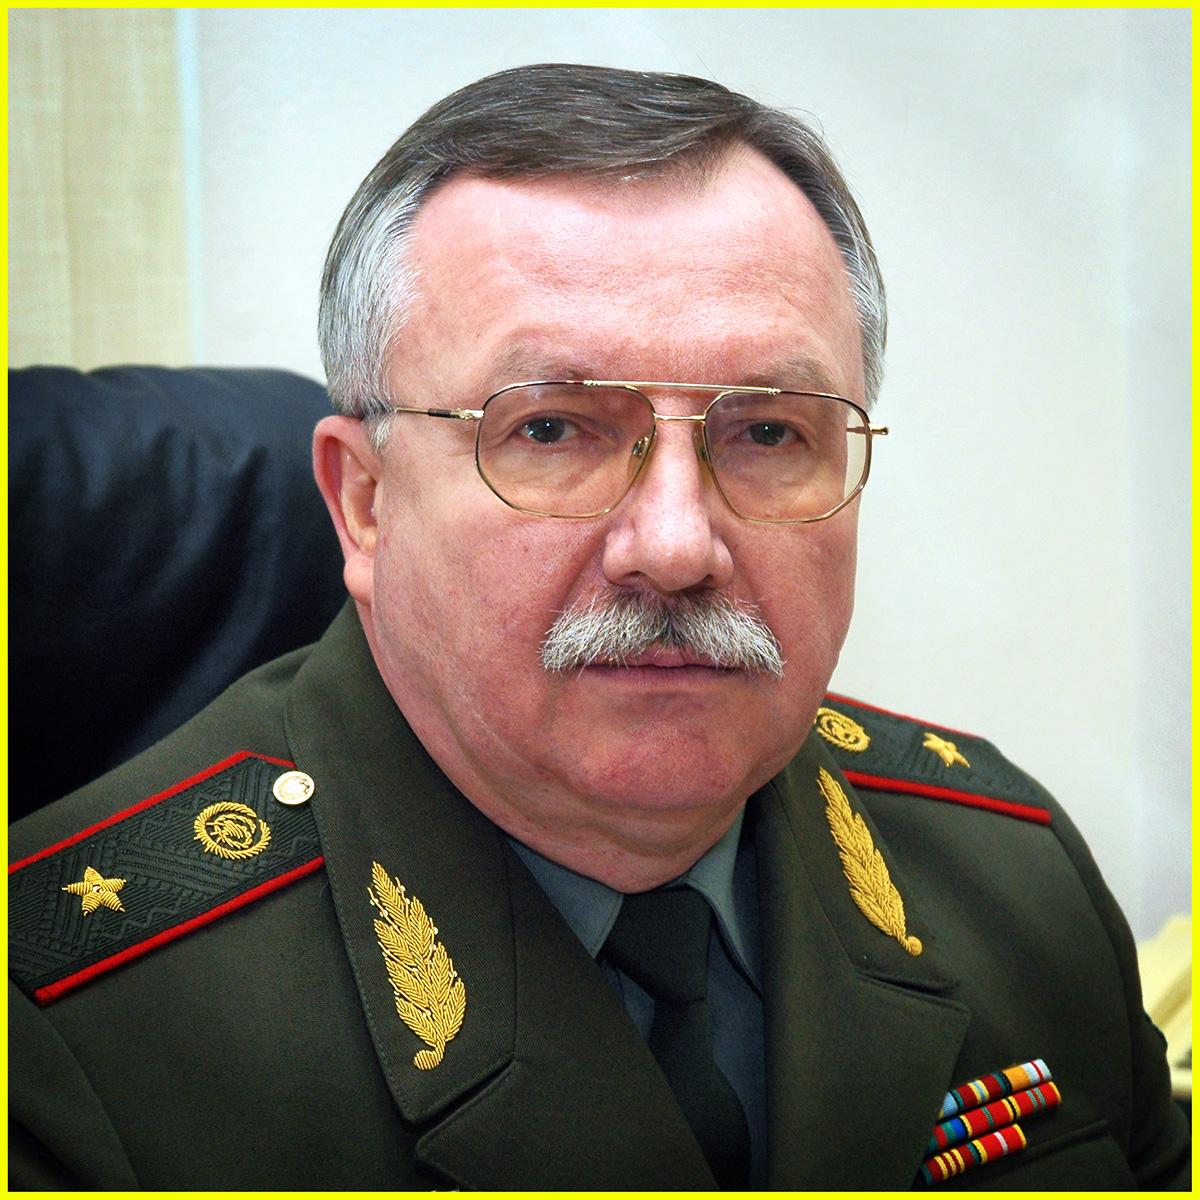 Корнюшко Игорь Геннадьевич